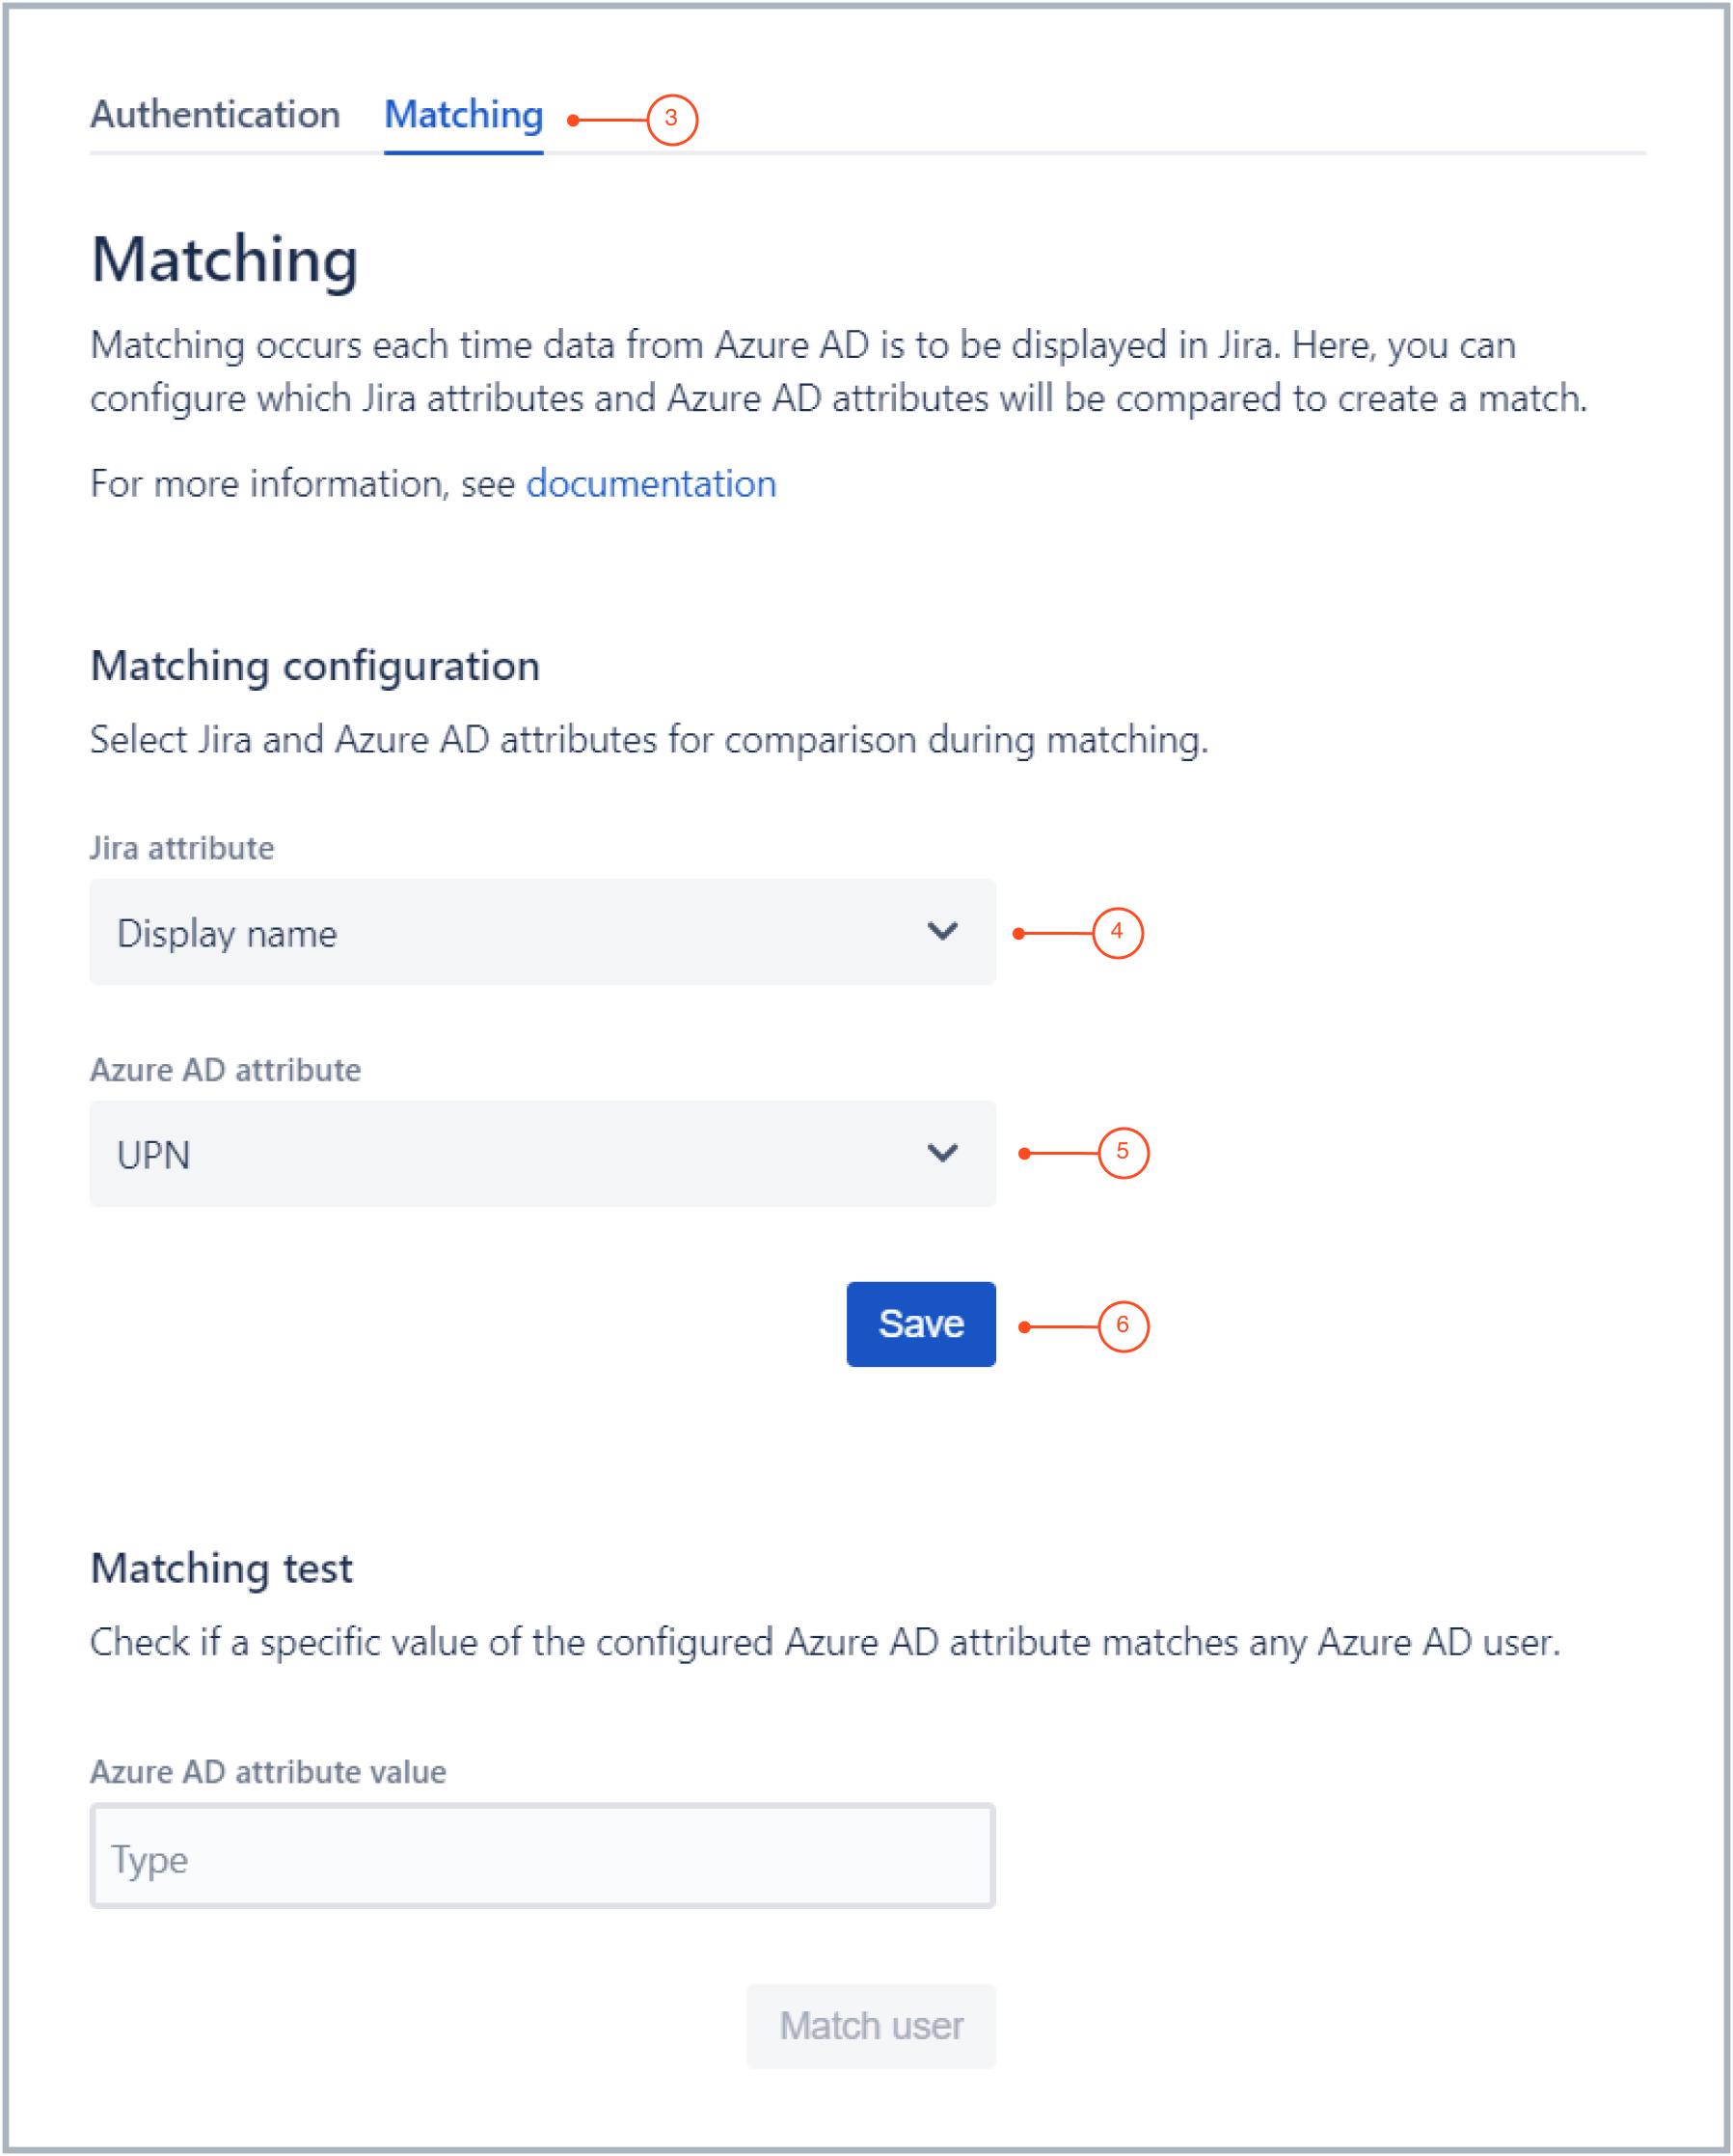 Configuring Matching